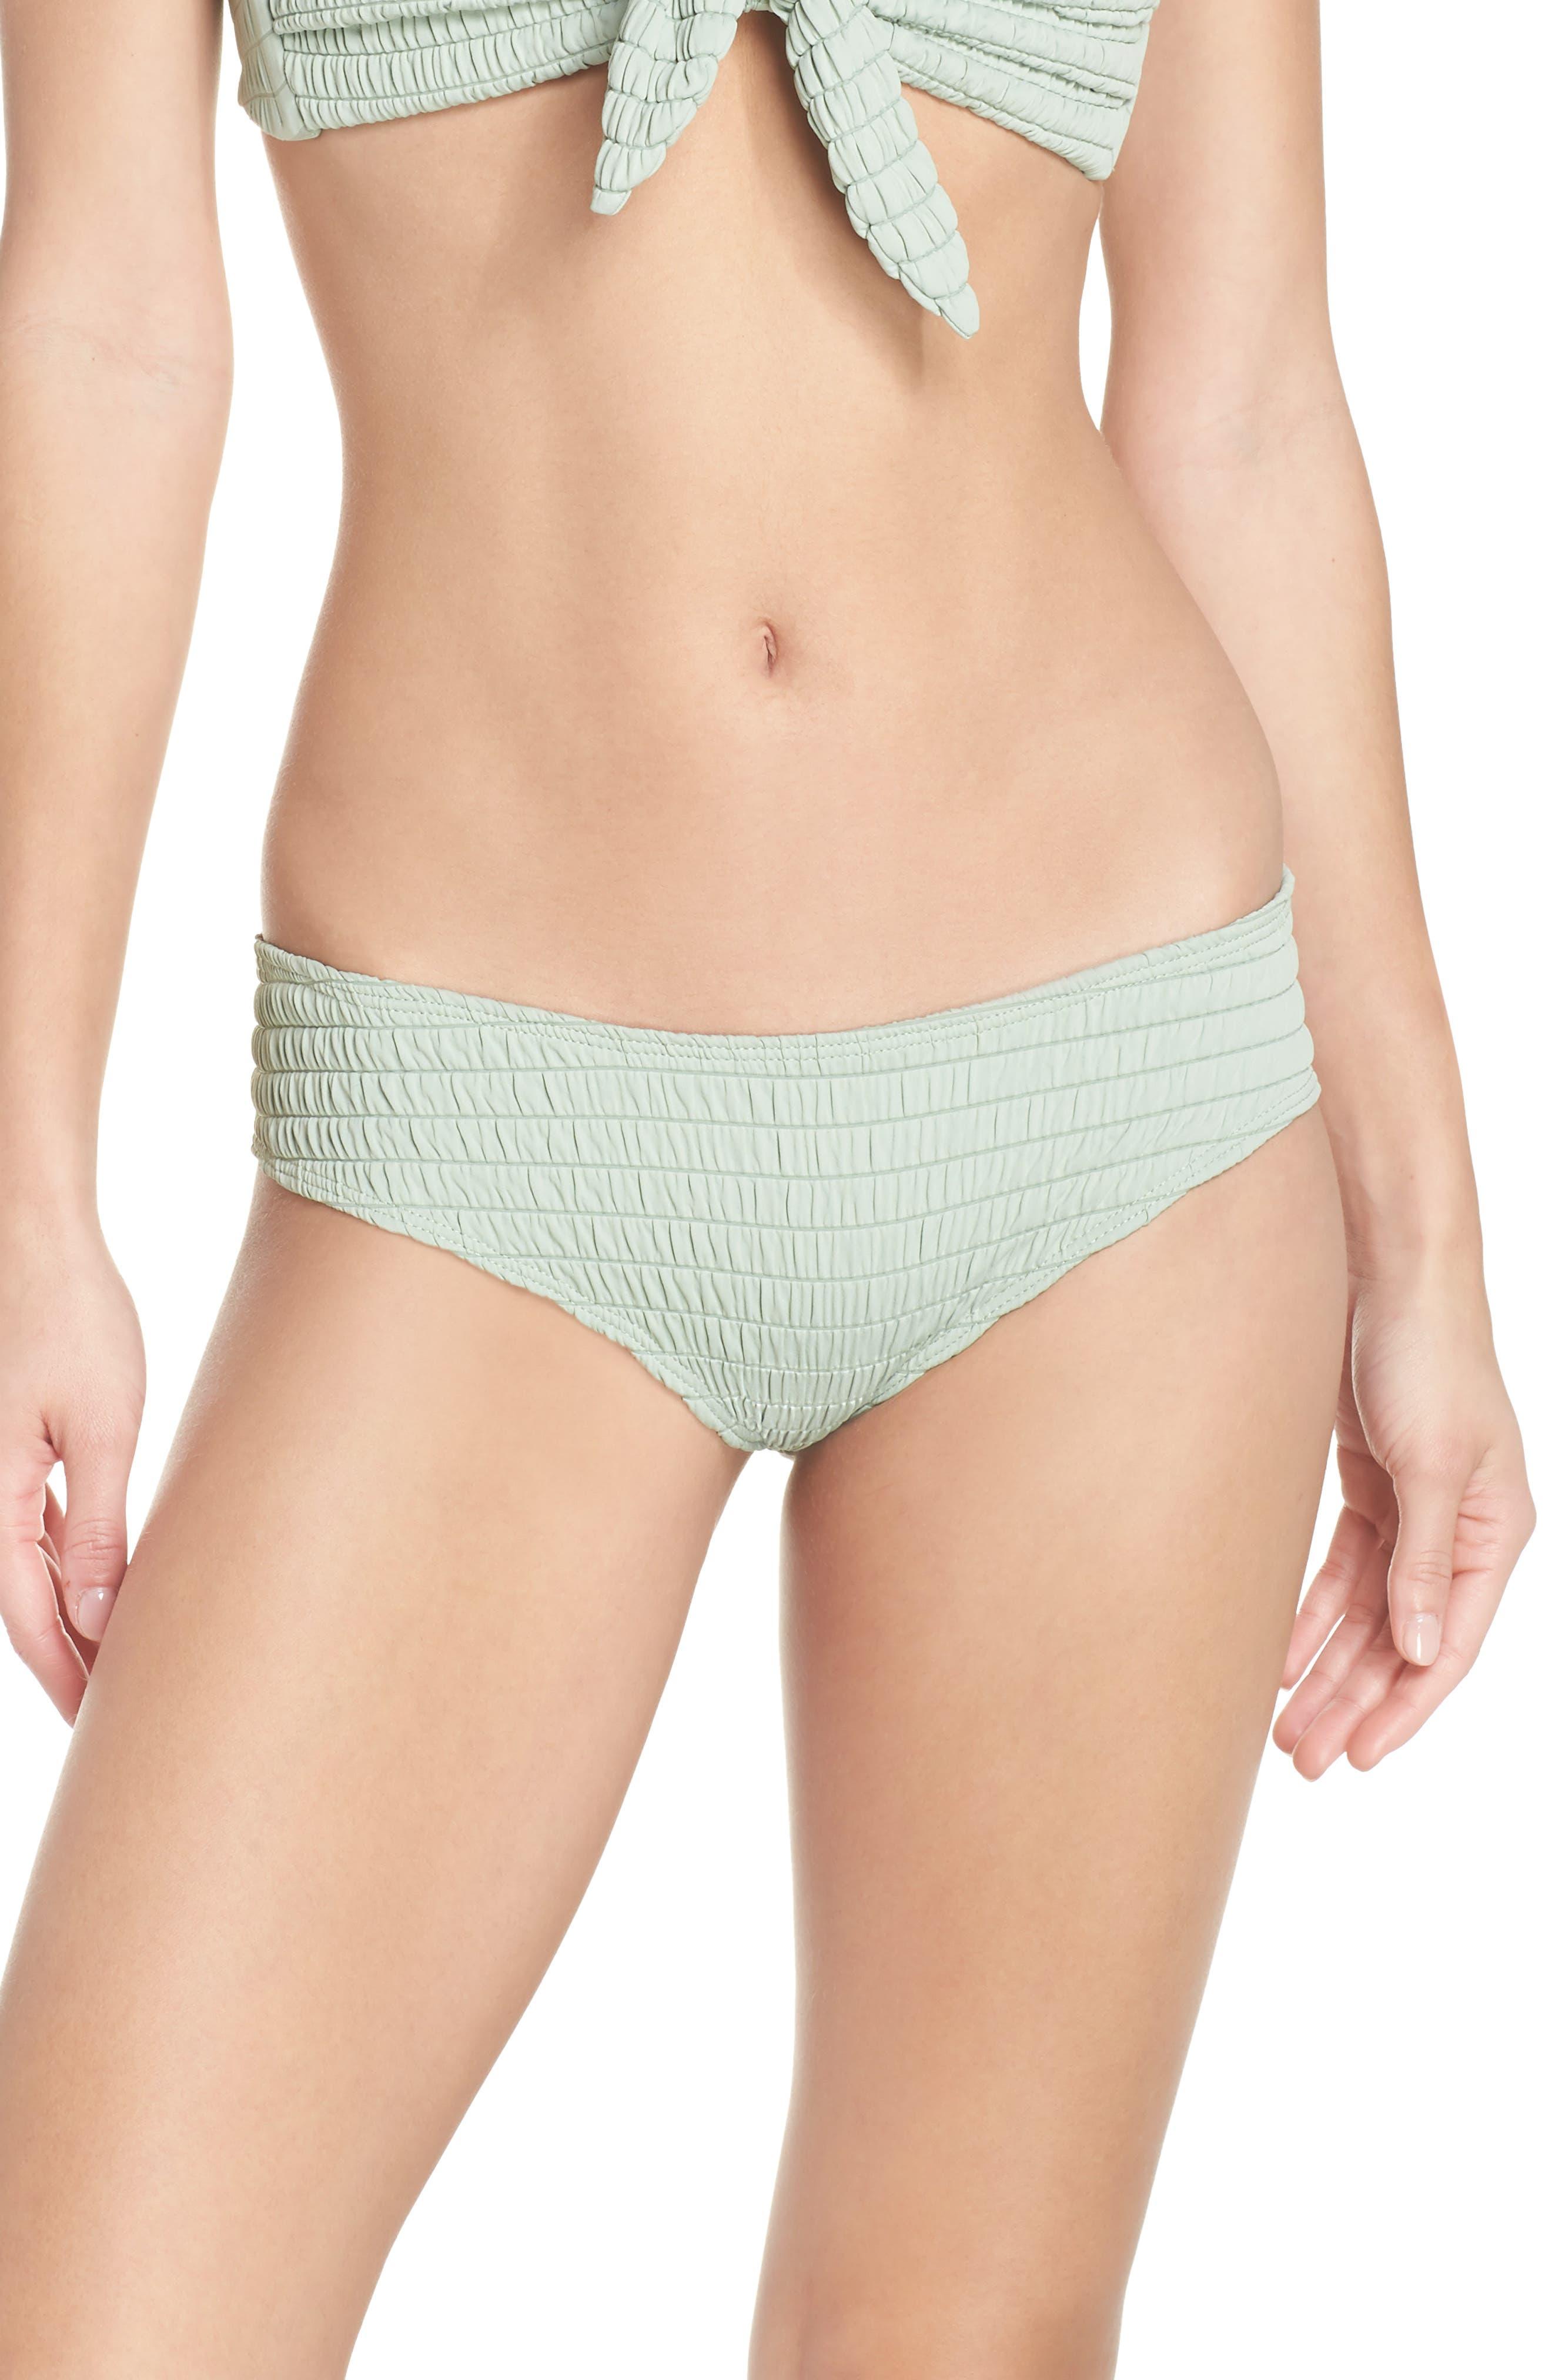 AC Nu Micro Bikini Bottoms,                             Main thumbnail 1, color,                             PISTACHE SCRUNCH GREEN